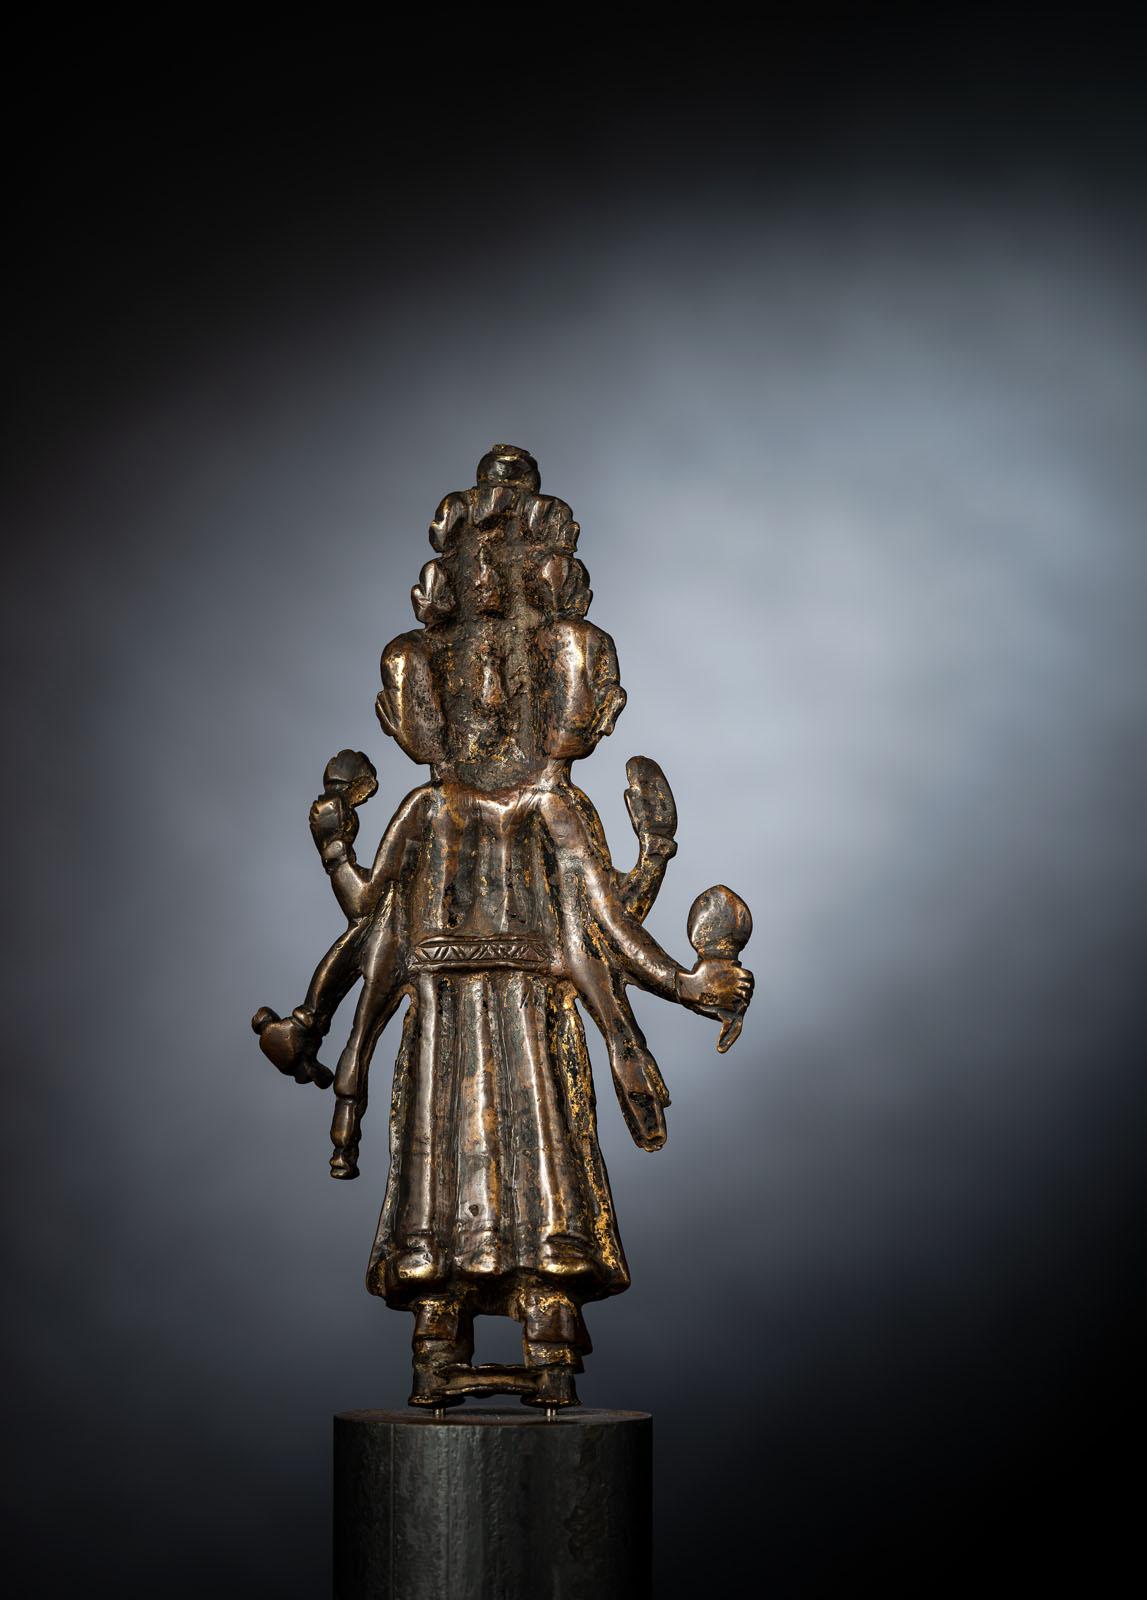 A VERY RARE BRONZE FIGURE OF EKADASHALOKESHVARA - Image 2 of 4